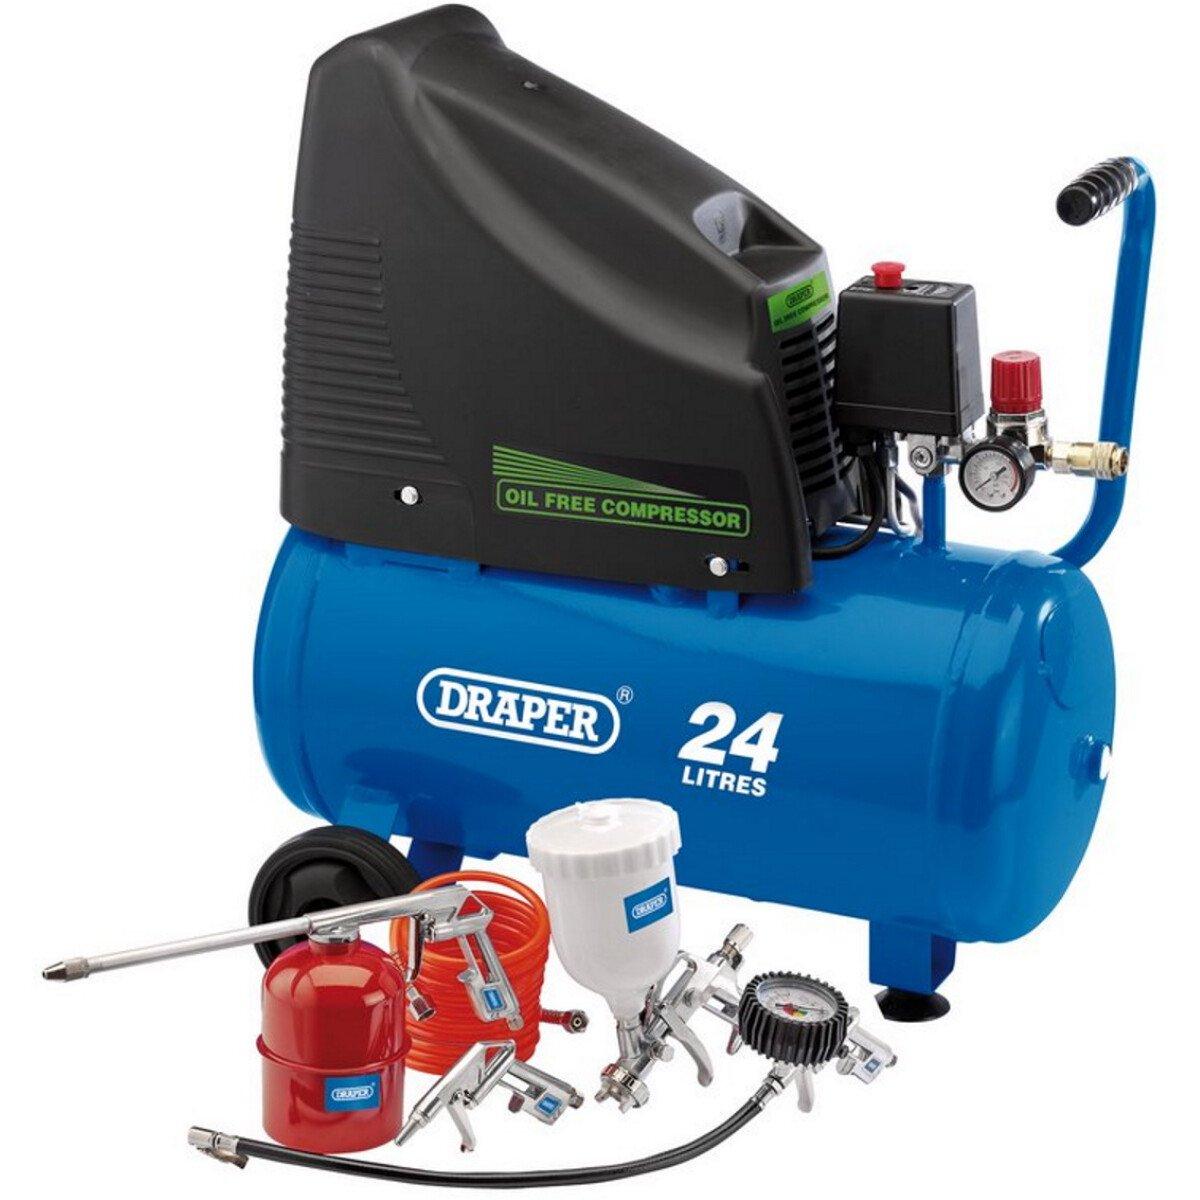 Draper 90126 DA25/19/K 230V 24L Oil Free Compressor and Air Tool Kit